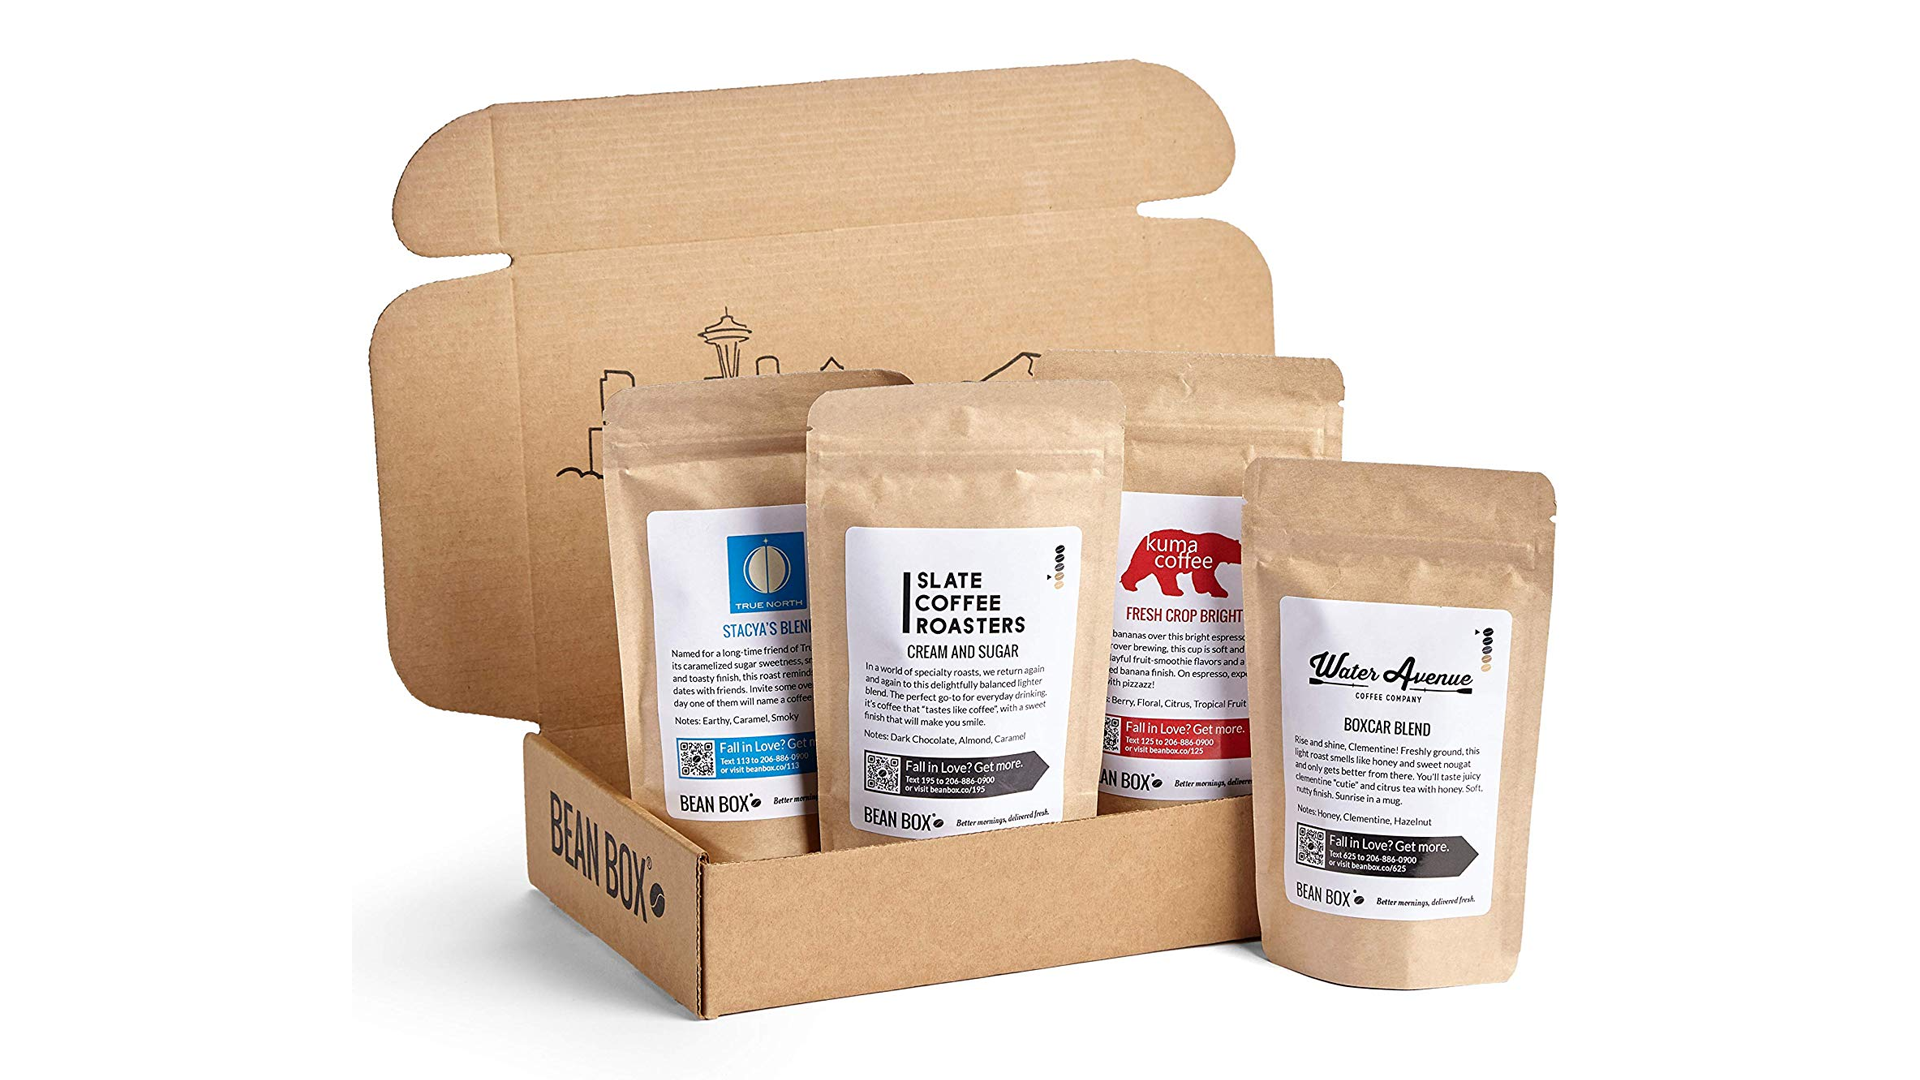 The Bean Box Gourmet Coffee Sampler